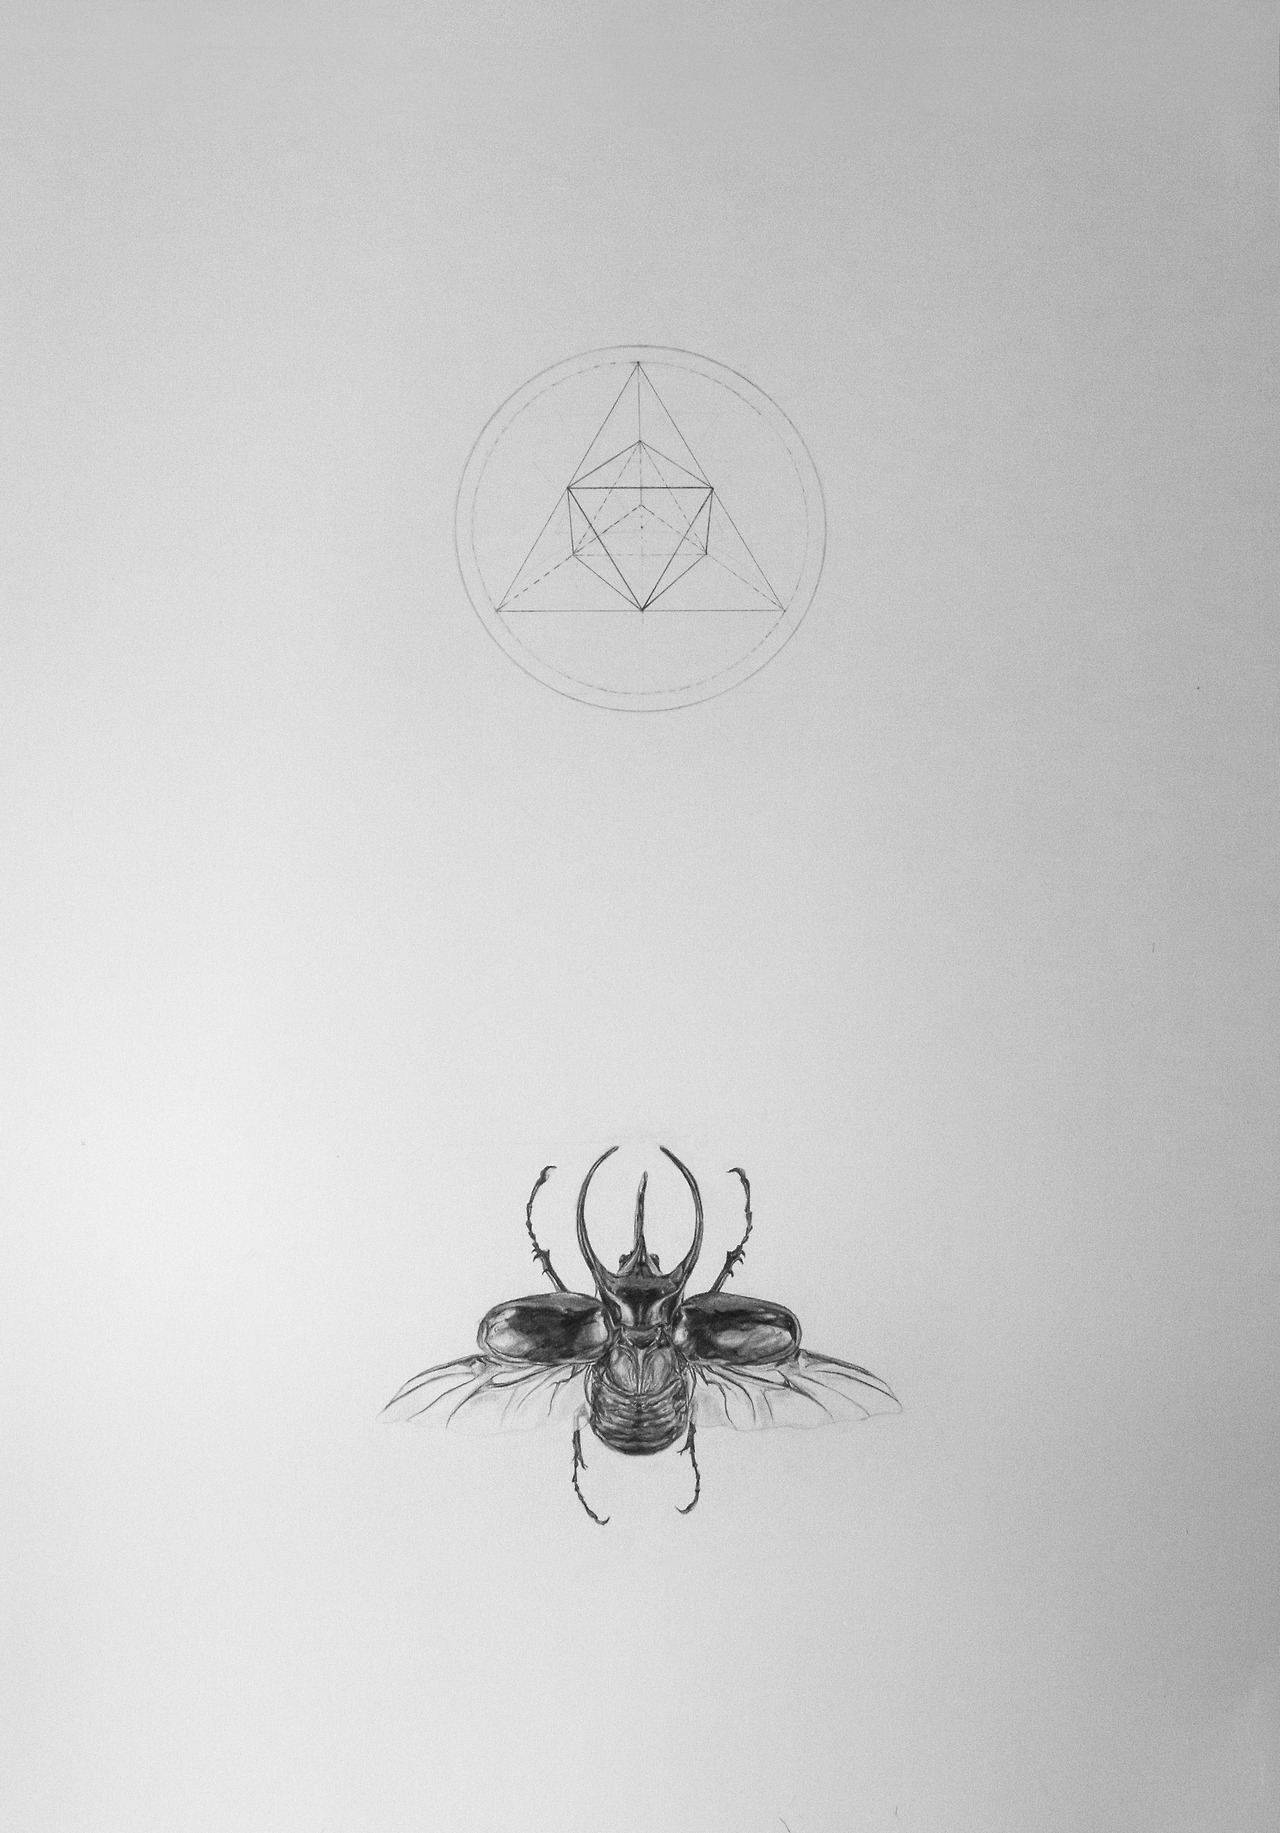 Drawn bugs scarab beetle #sacred #sacred #scarab Scarab #rhino